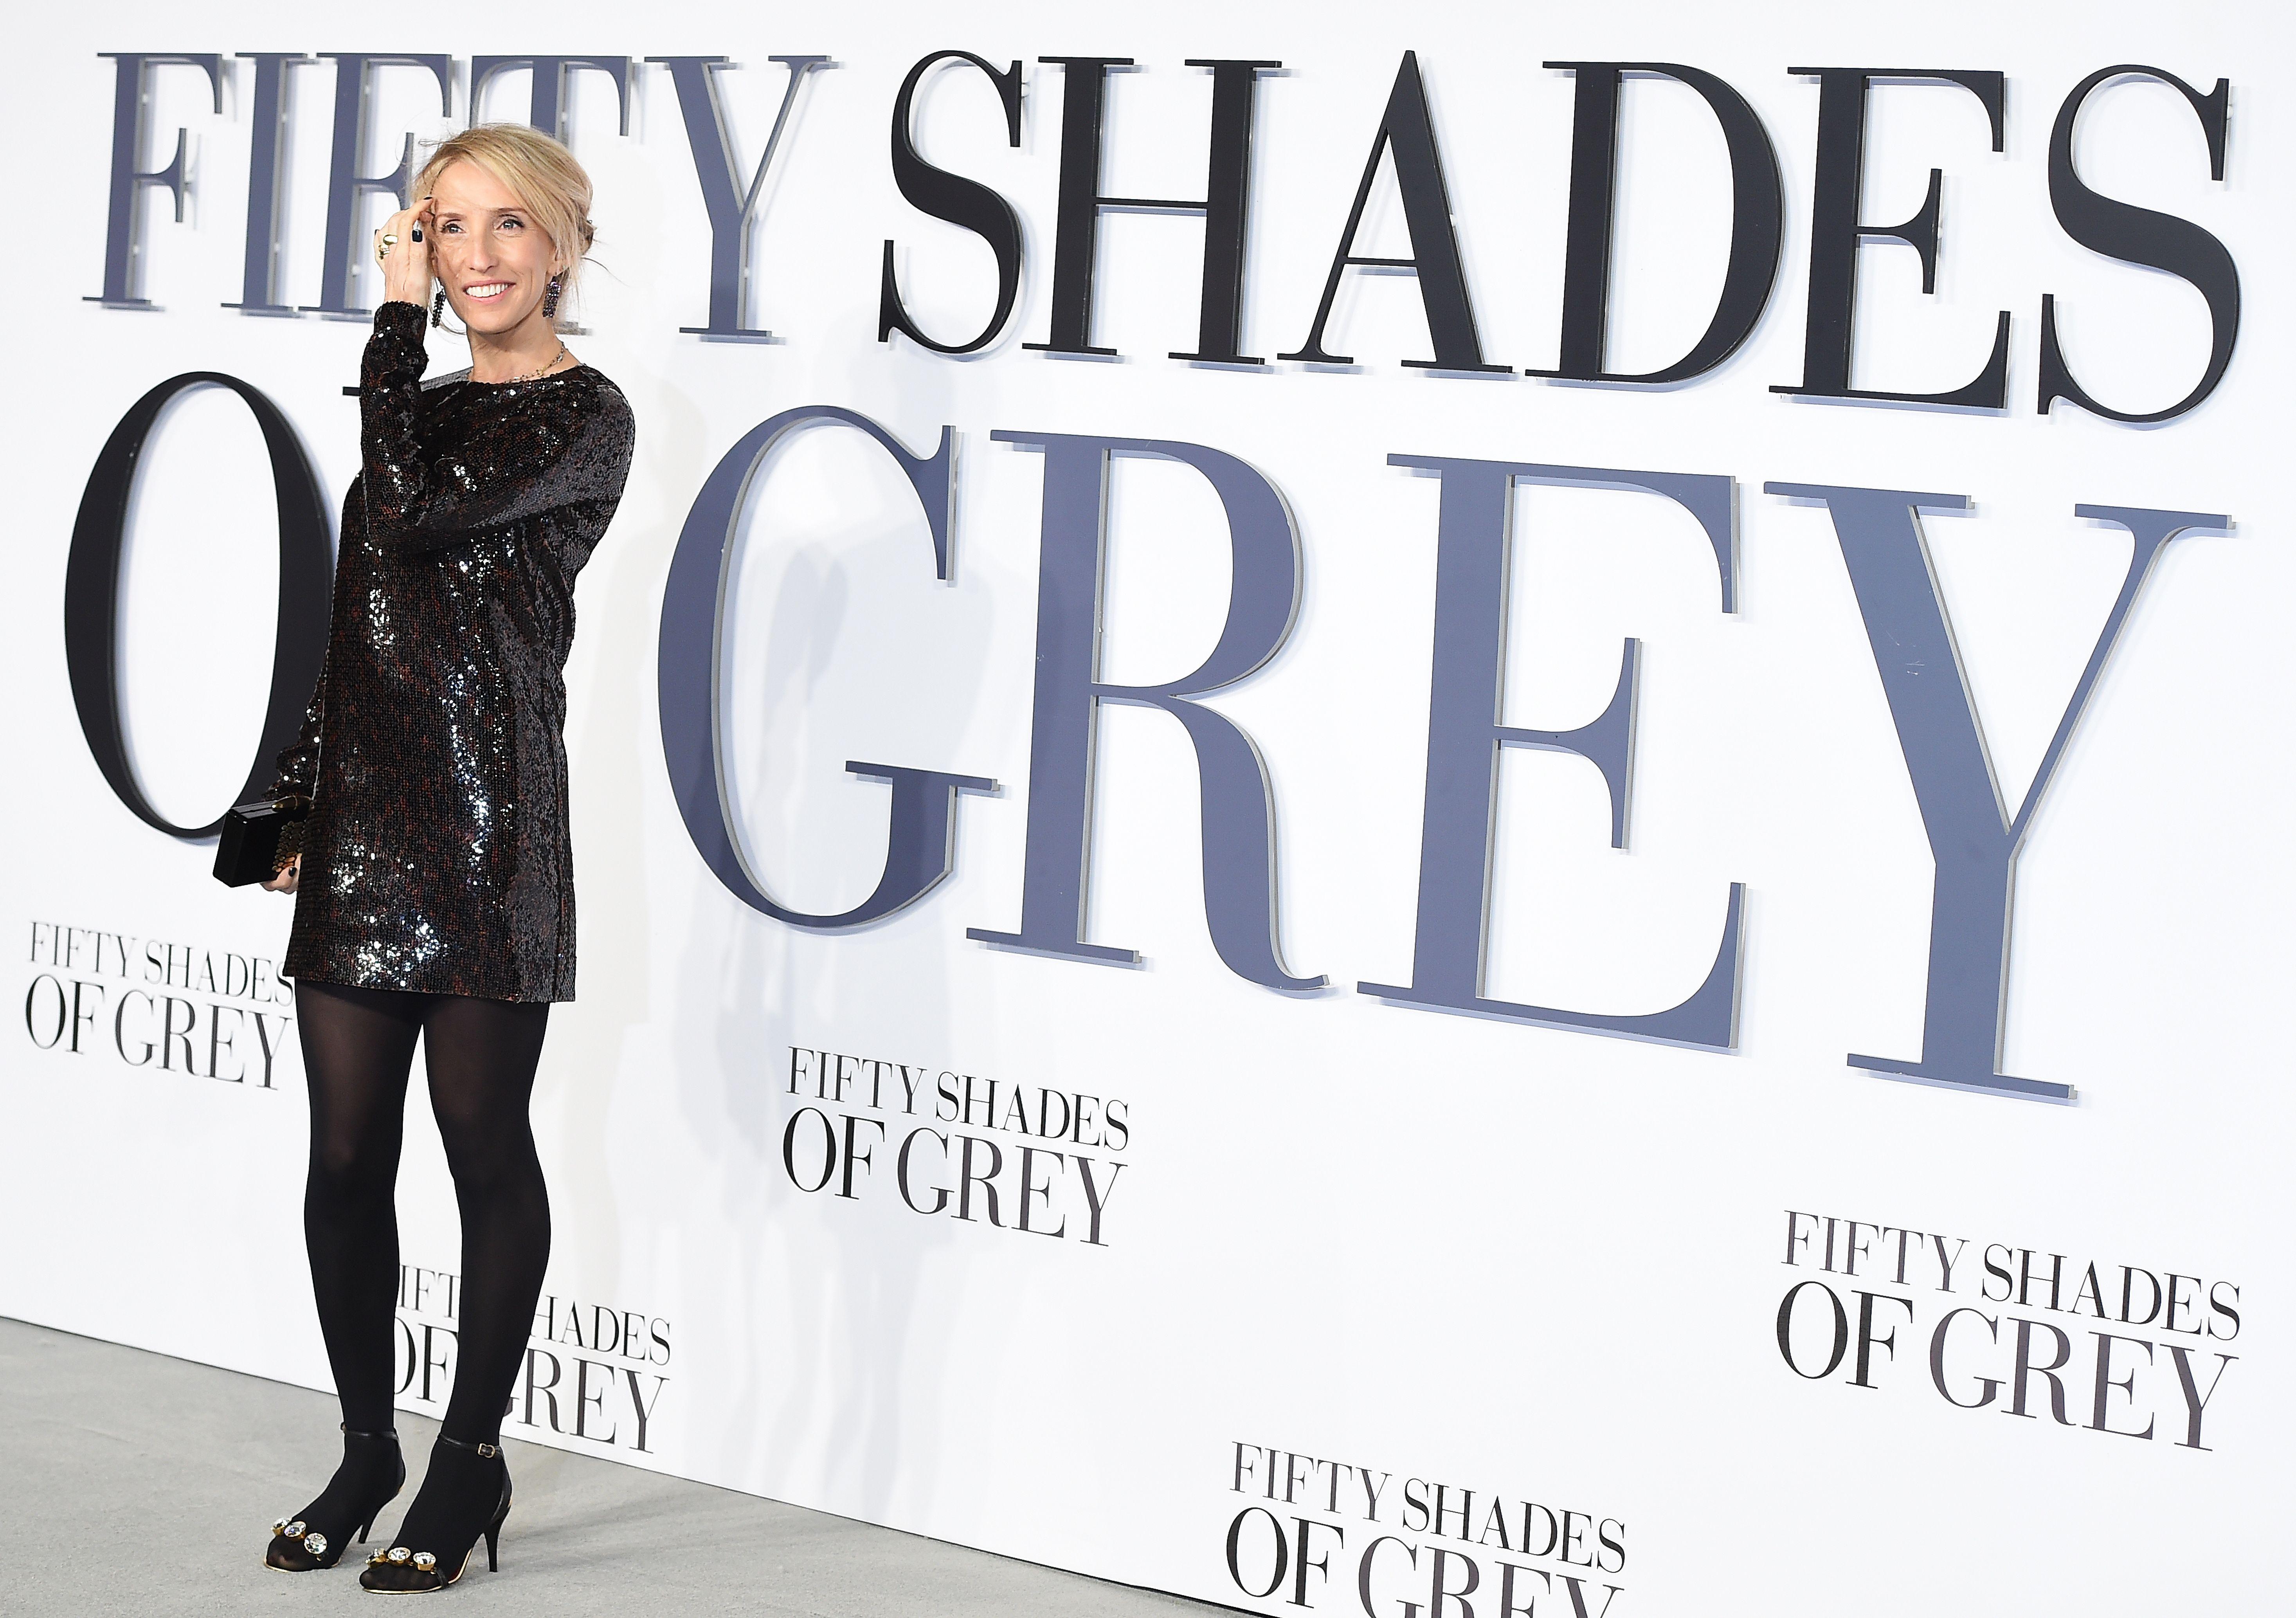 Fifty Shades Of Grey Director Sam Taylor Johnson Regrets Making It